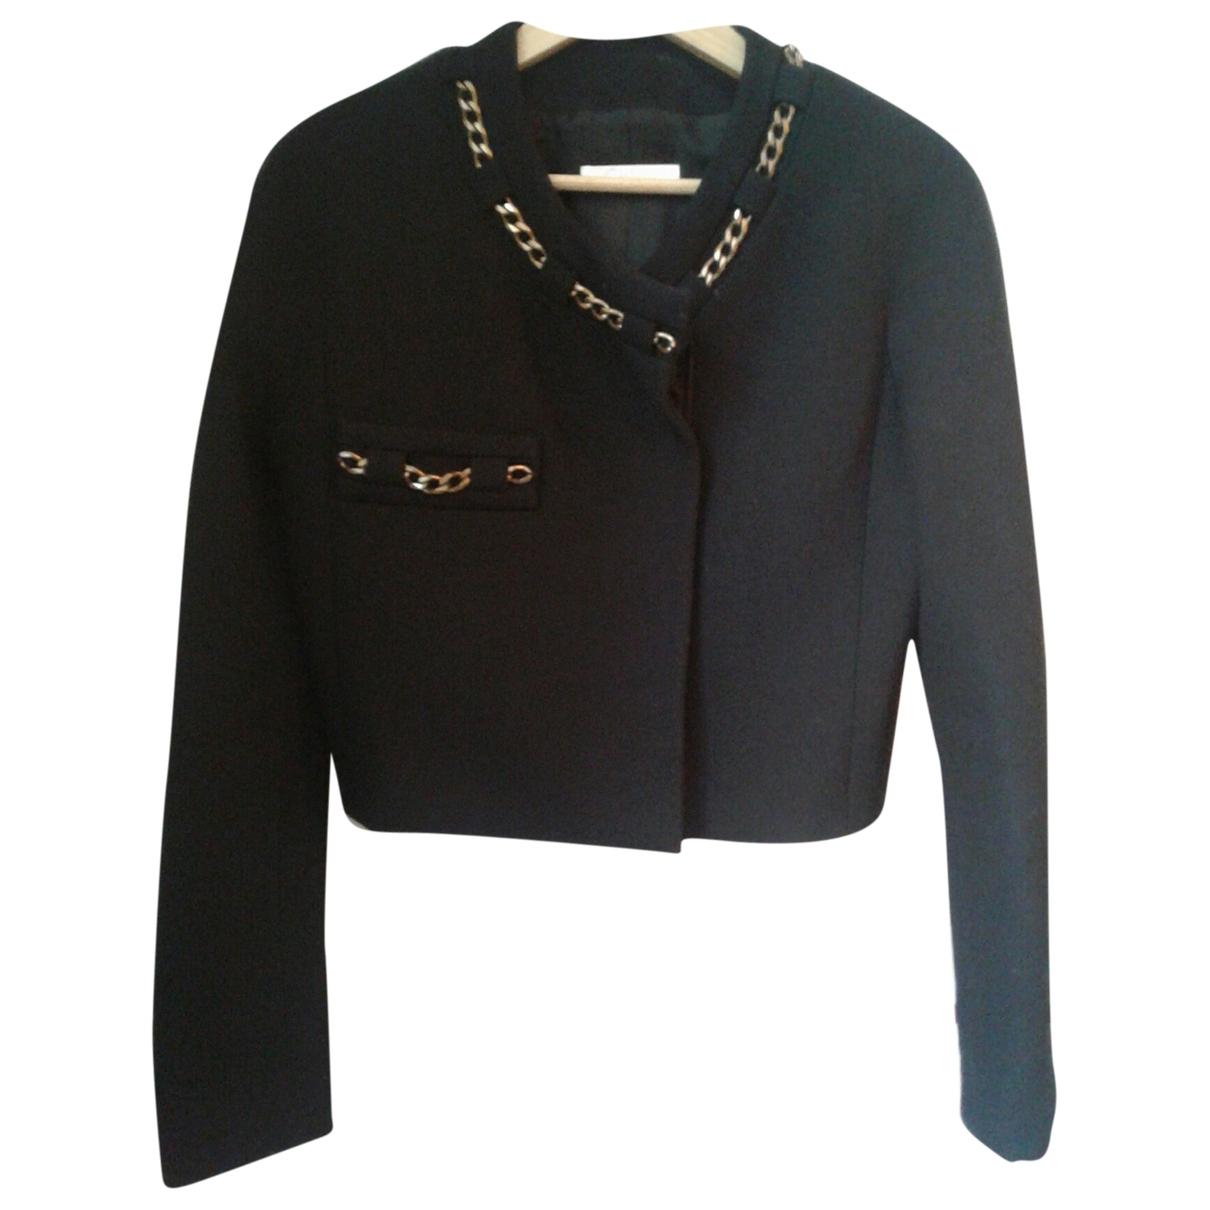 Chloé \N Black Wool jacket for Women 40 FR